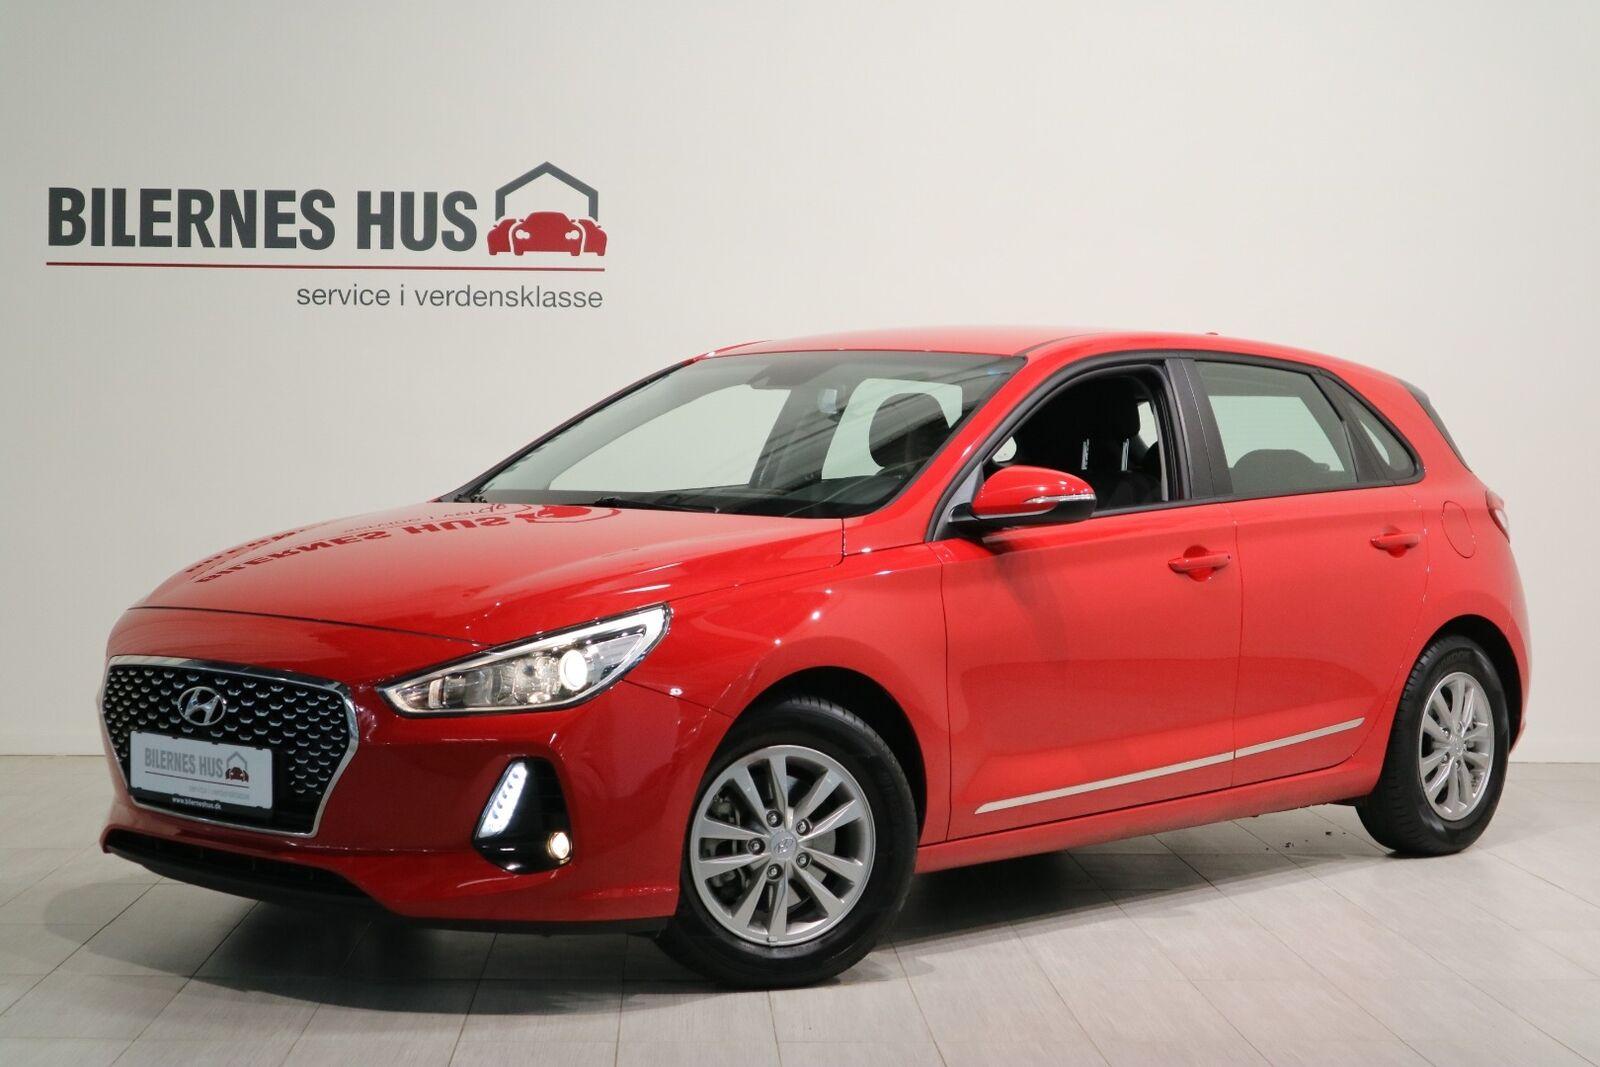 Hyundai i30 Billede 1